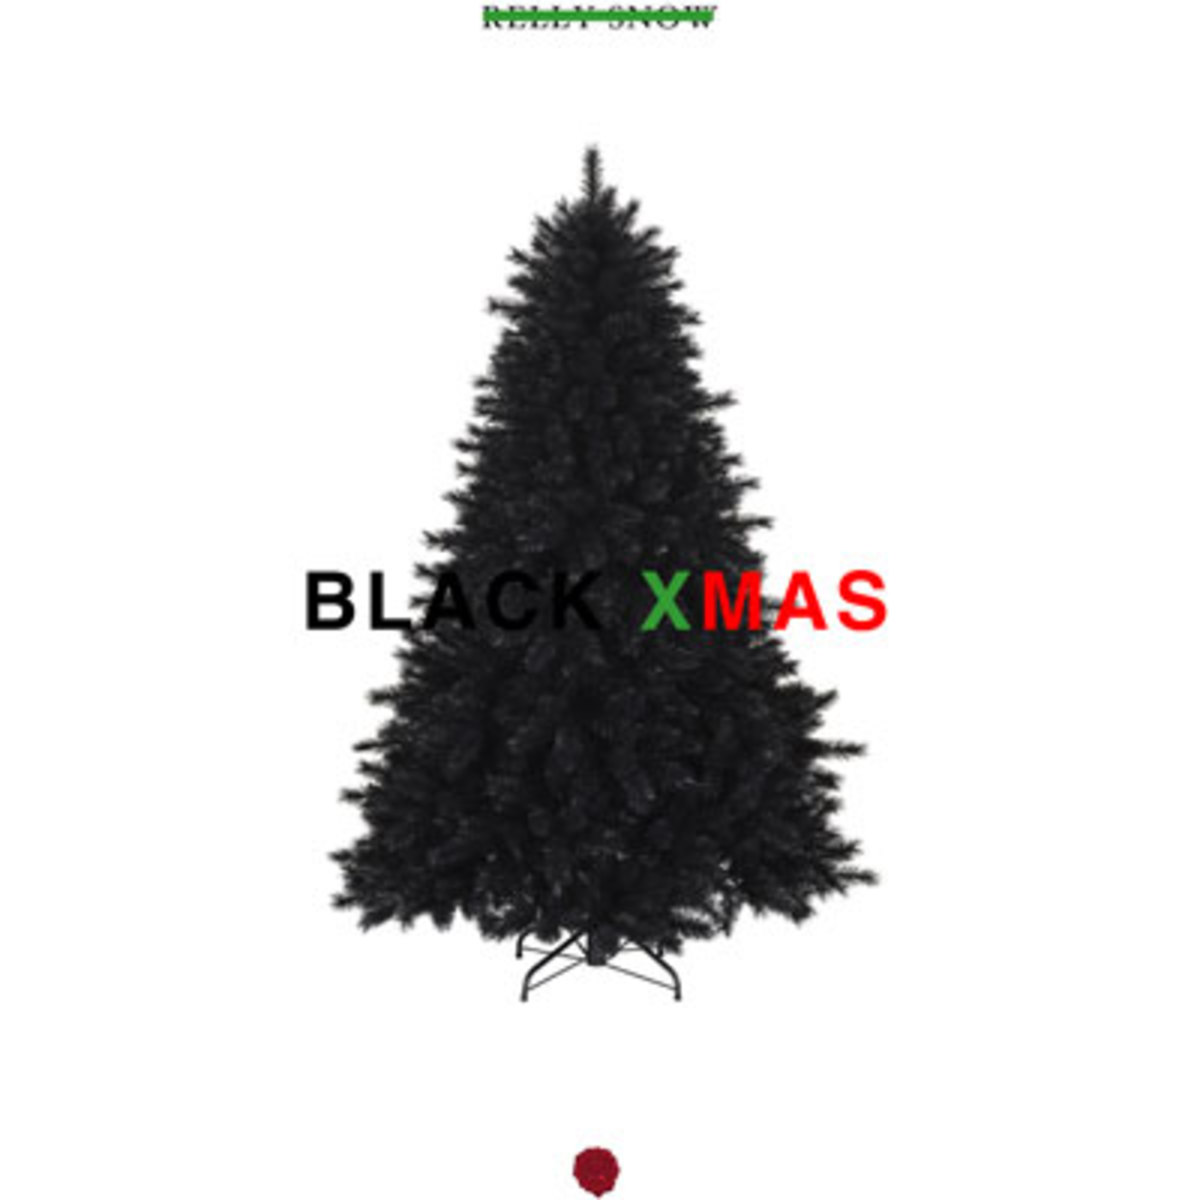 rellysnow-blackxmas.jpg